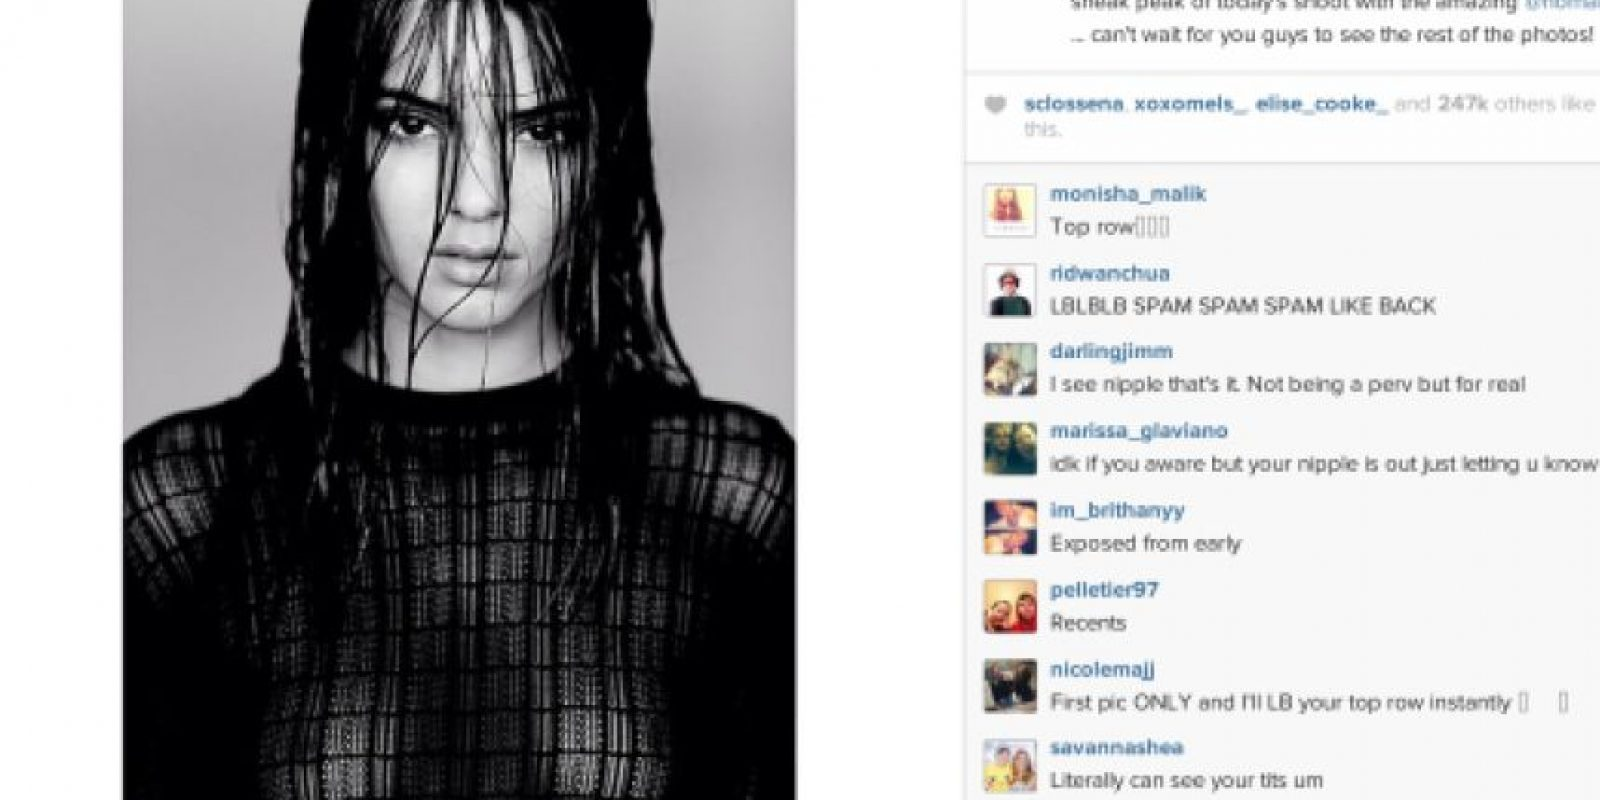 Esta imagen había recibido miles de likes, pero Kendall Jenner decidió eliminarla. Foto:vía instagram.com/kendalljenner